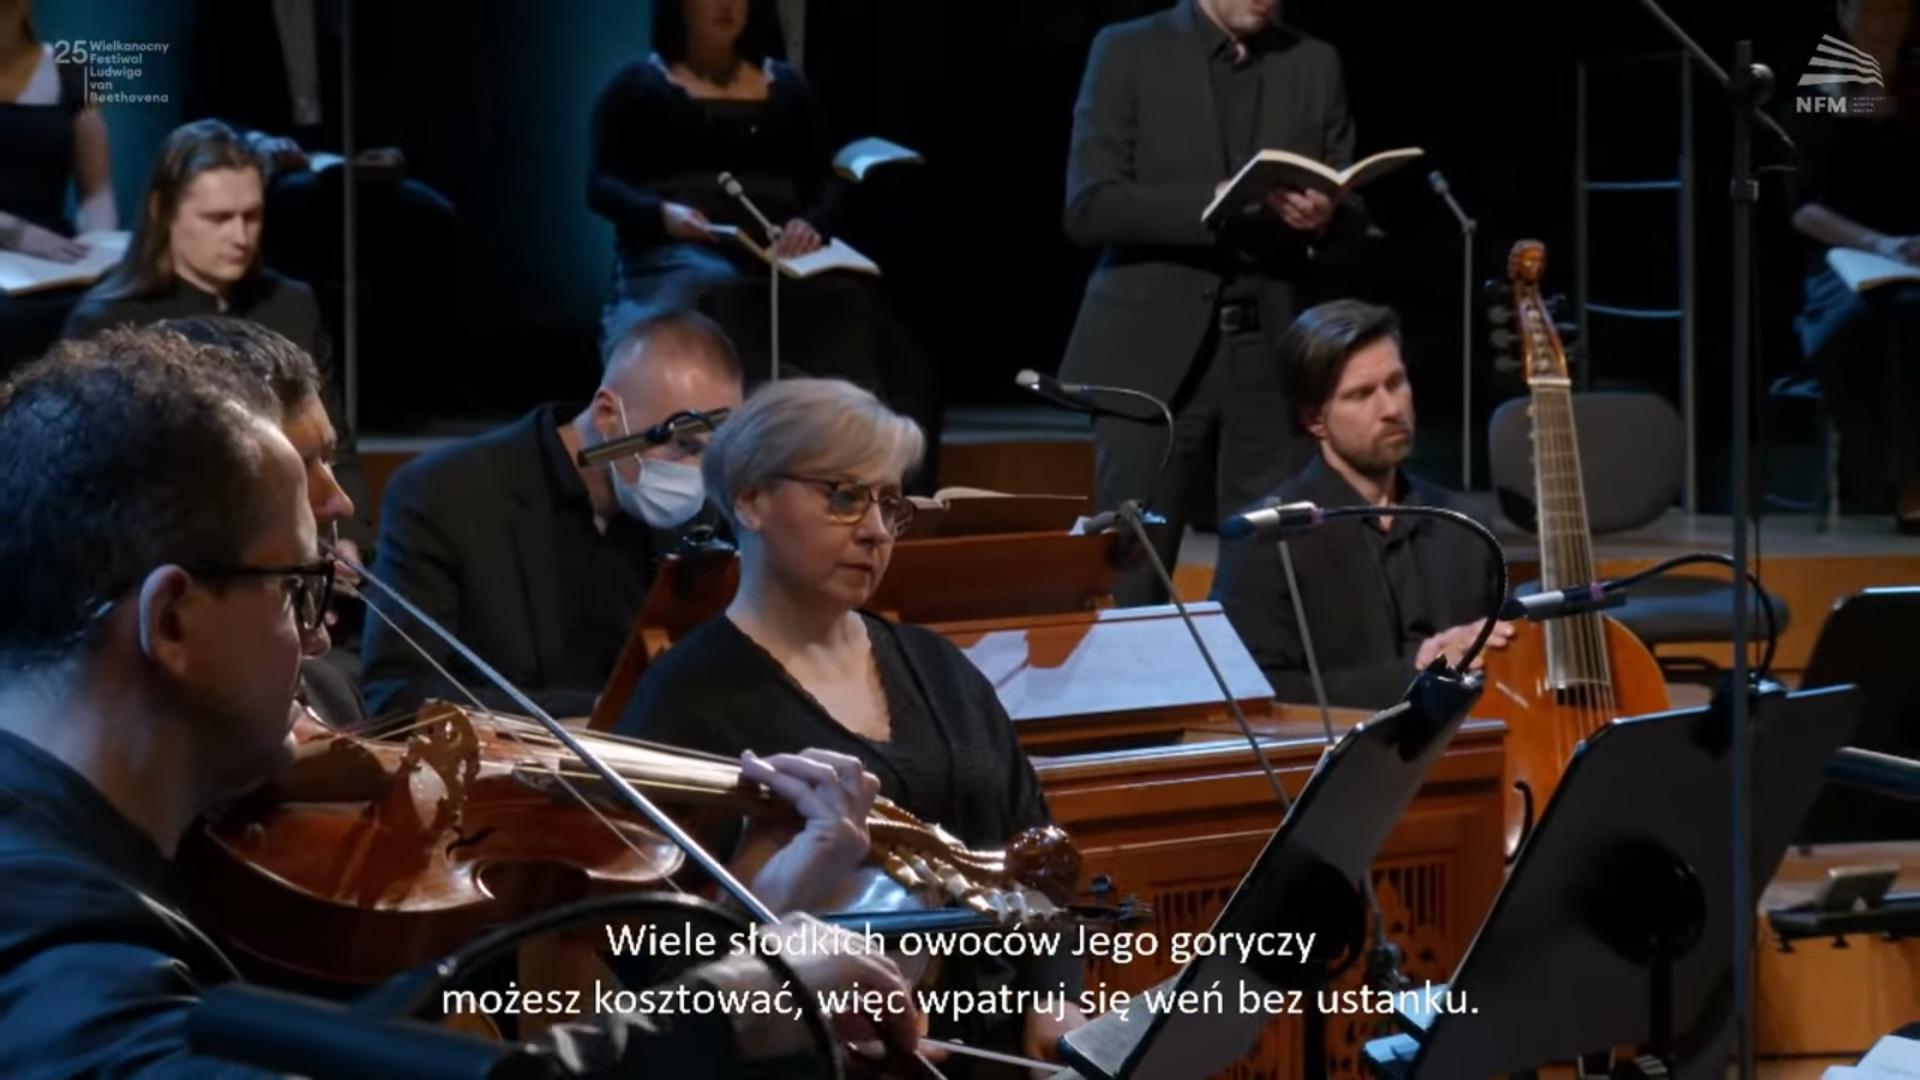 Pasja wg św. Jana | online | 25. Wielkanocny Festiwal Ludwiga van Beethovena